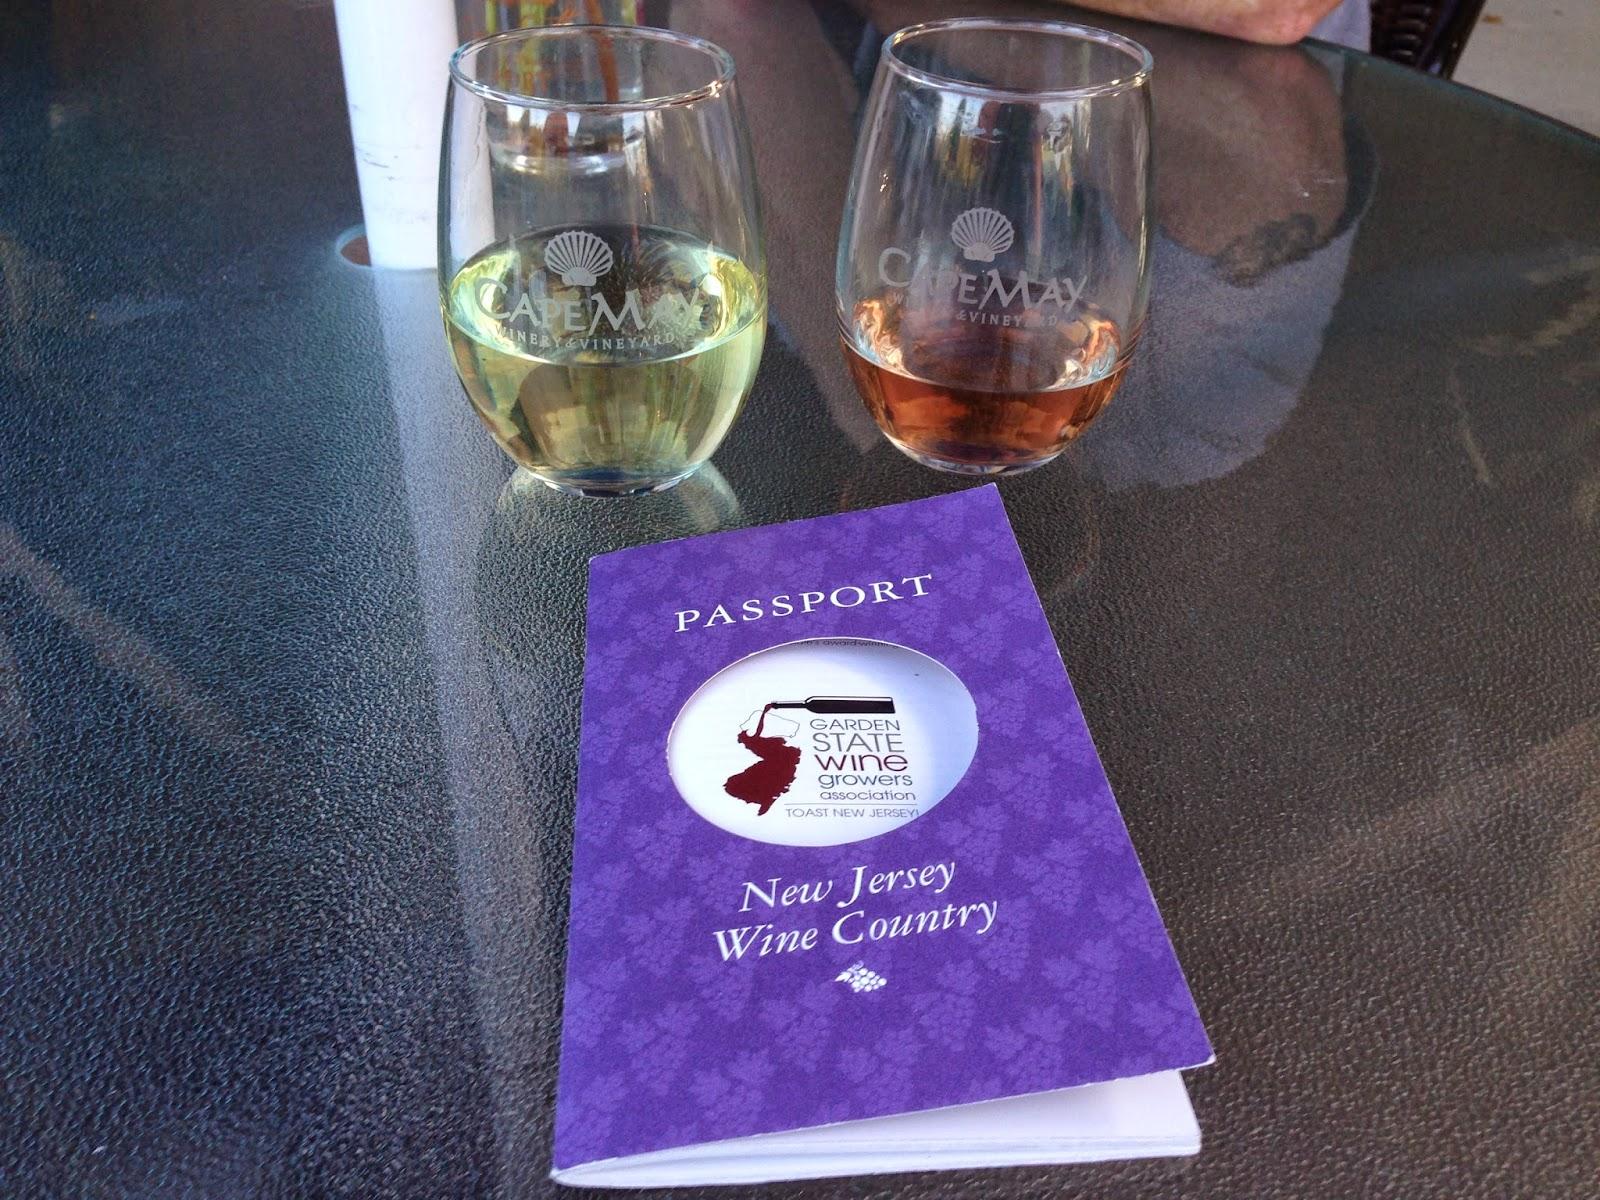 NJ wine passport program - Cape May wine trail